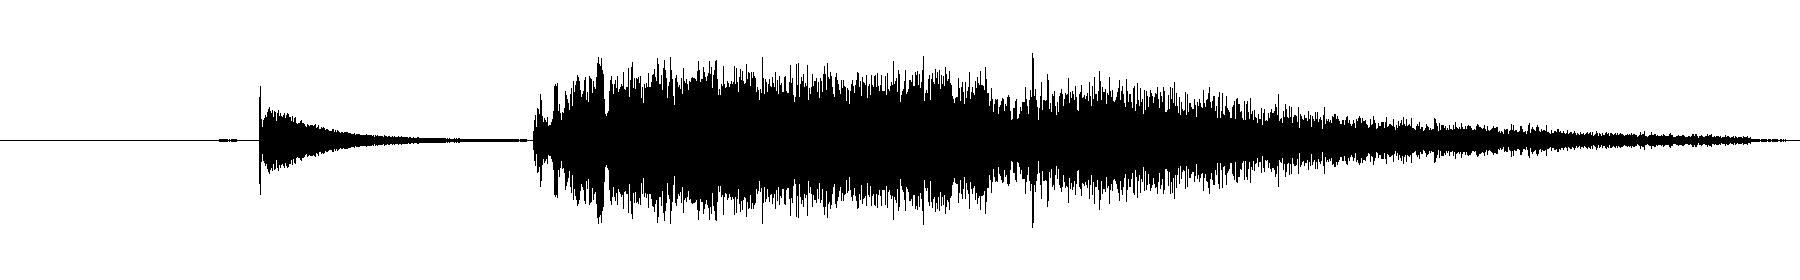 atmos 8